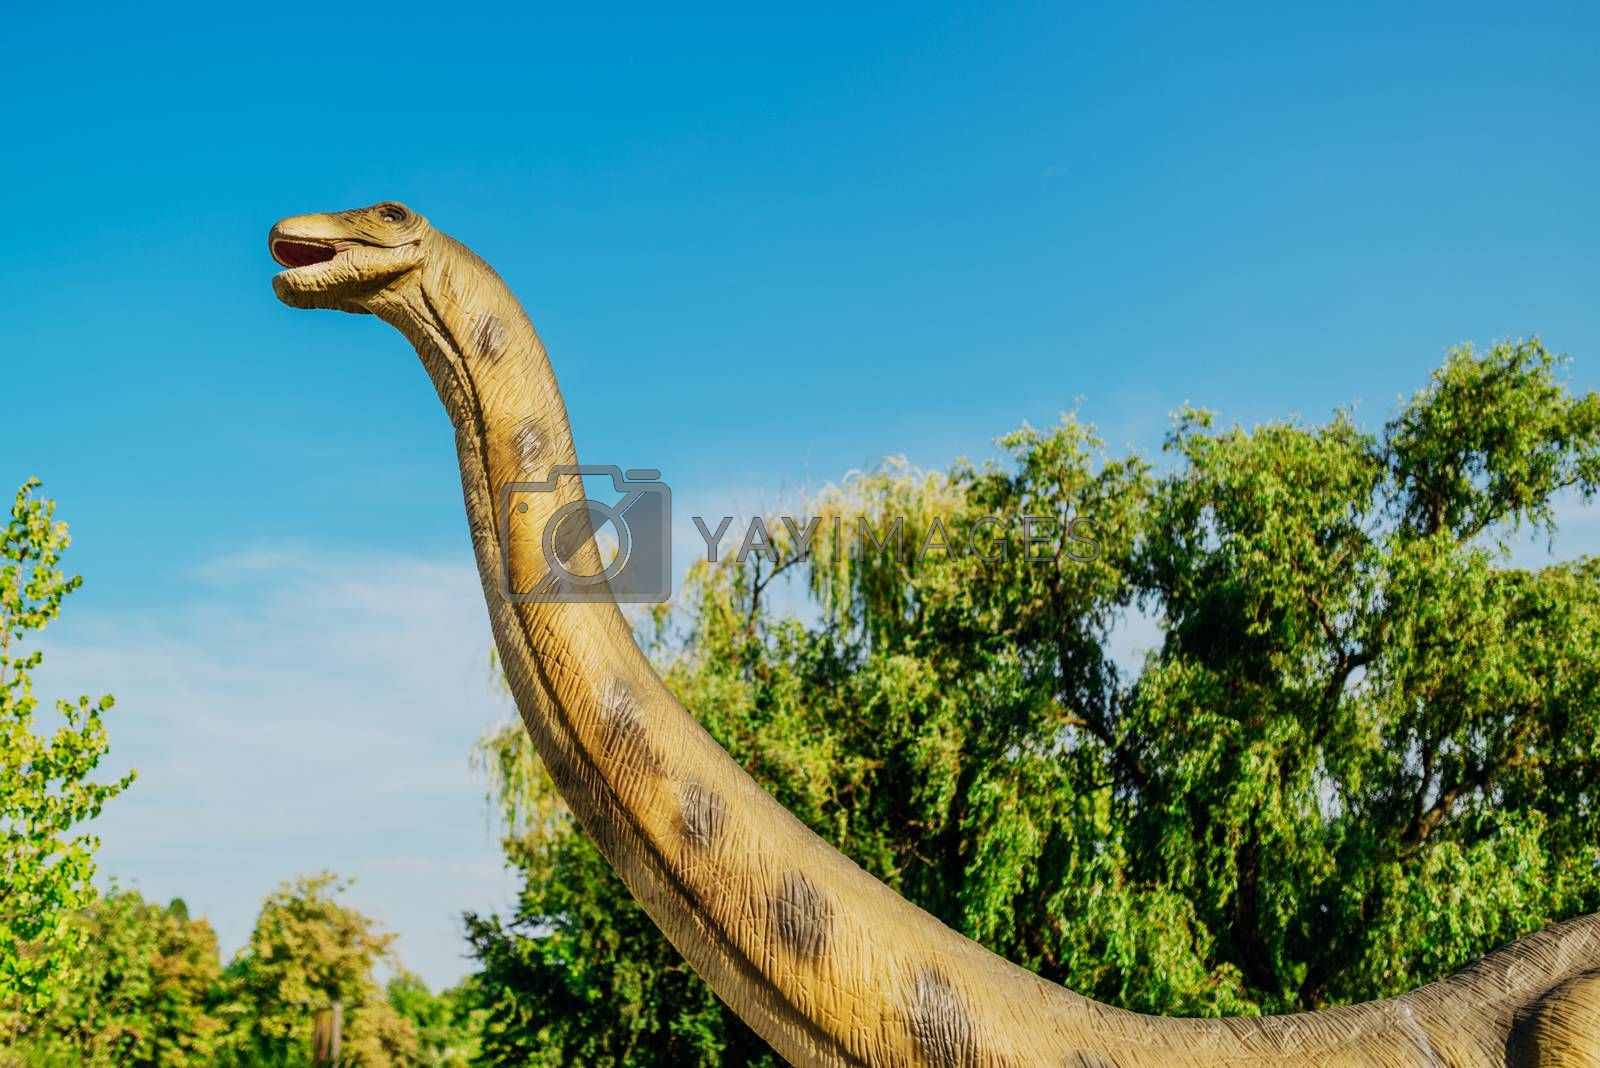 NOVI SAD, SERBIA - AUGUST 7, 2016: Brontosaurus life size model of prehistoric animal in theme entertainment Dino Park. Species of Brontosaurus range in age from 155 to 152 million years ago.